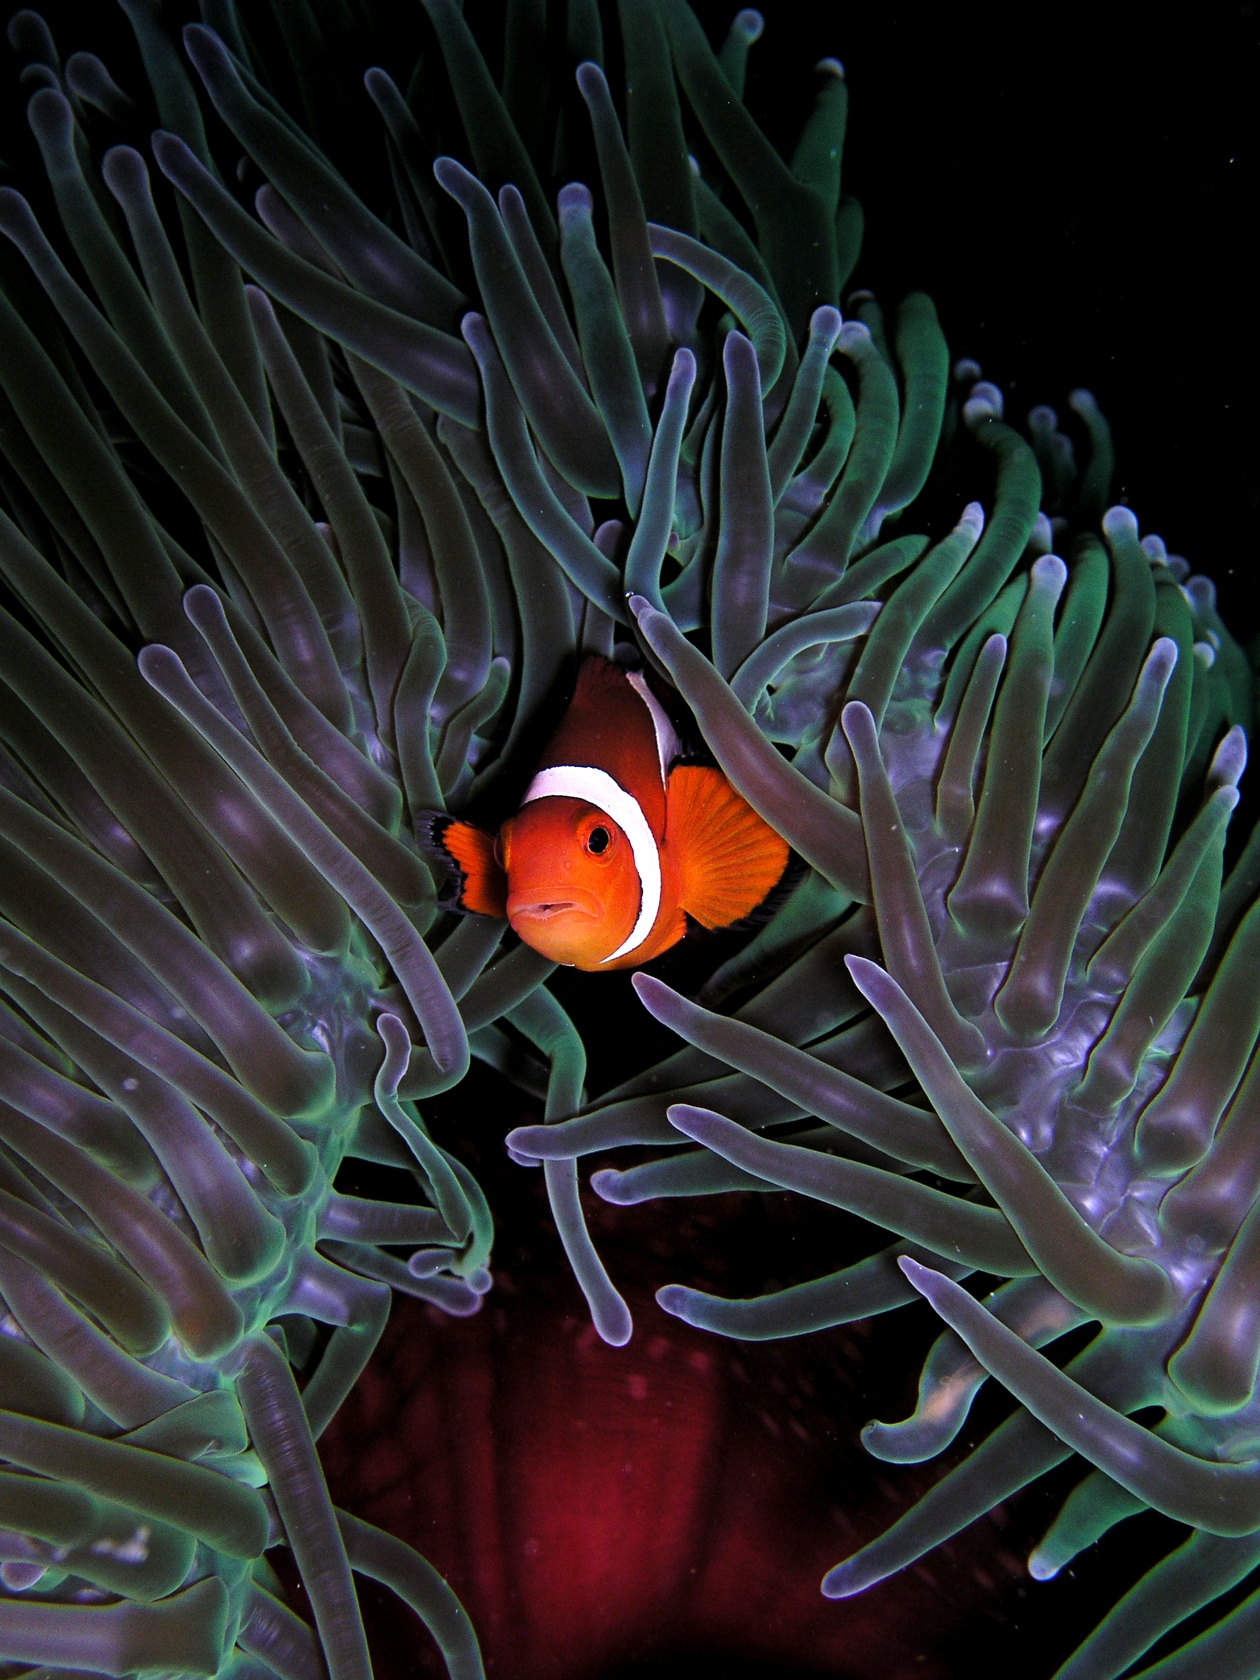 File:amphiprion Ocellaris (Clown Anemonefish) In Heteractis intérieur Anémone Des Mers